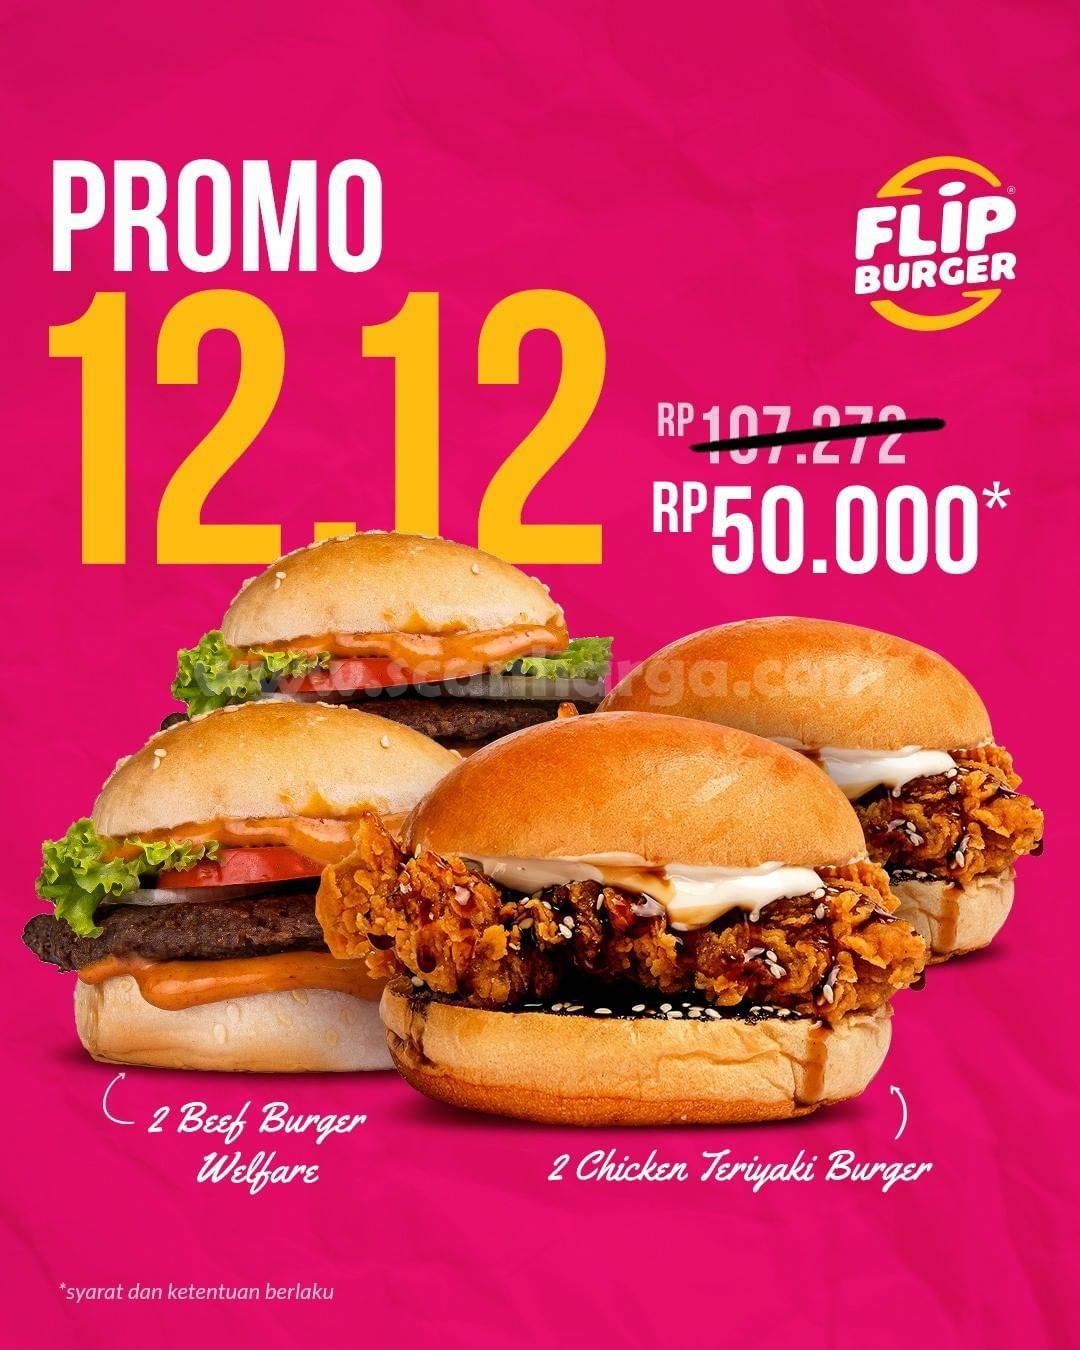 Flip Burger Promo 12.12 – 2 Beef Burger + 2 Chicken Teriyaki hanya Rp 50.000